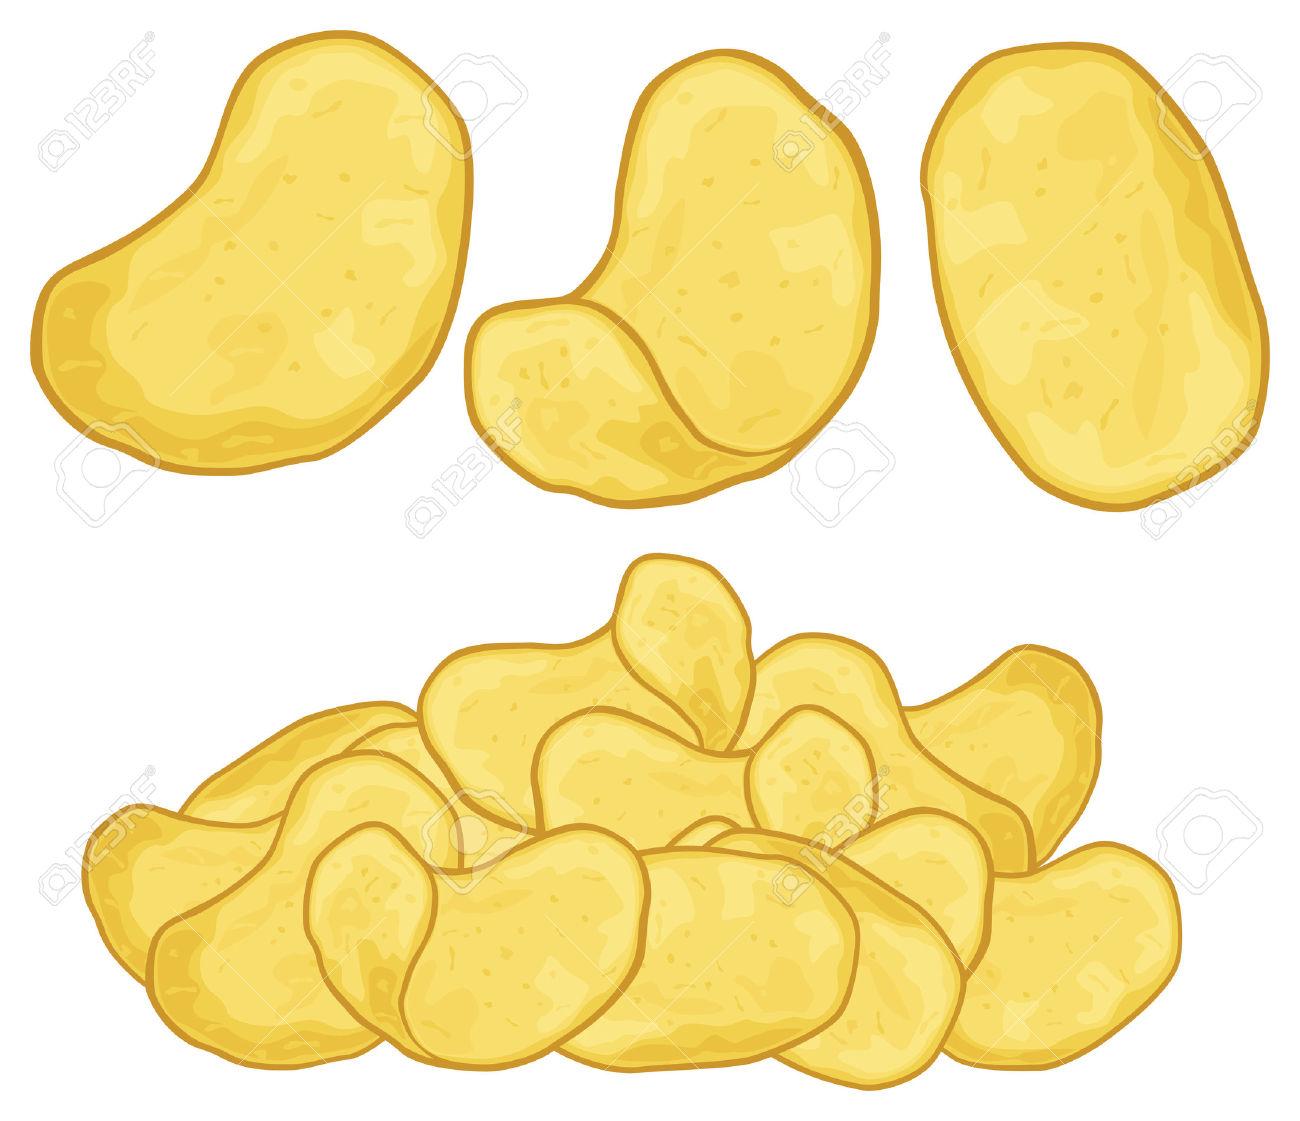 Potato chip panda free. Chips clipart animated